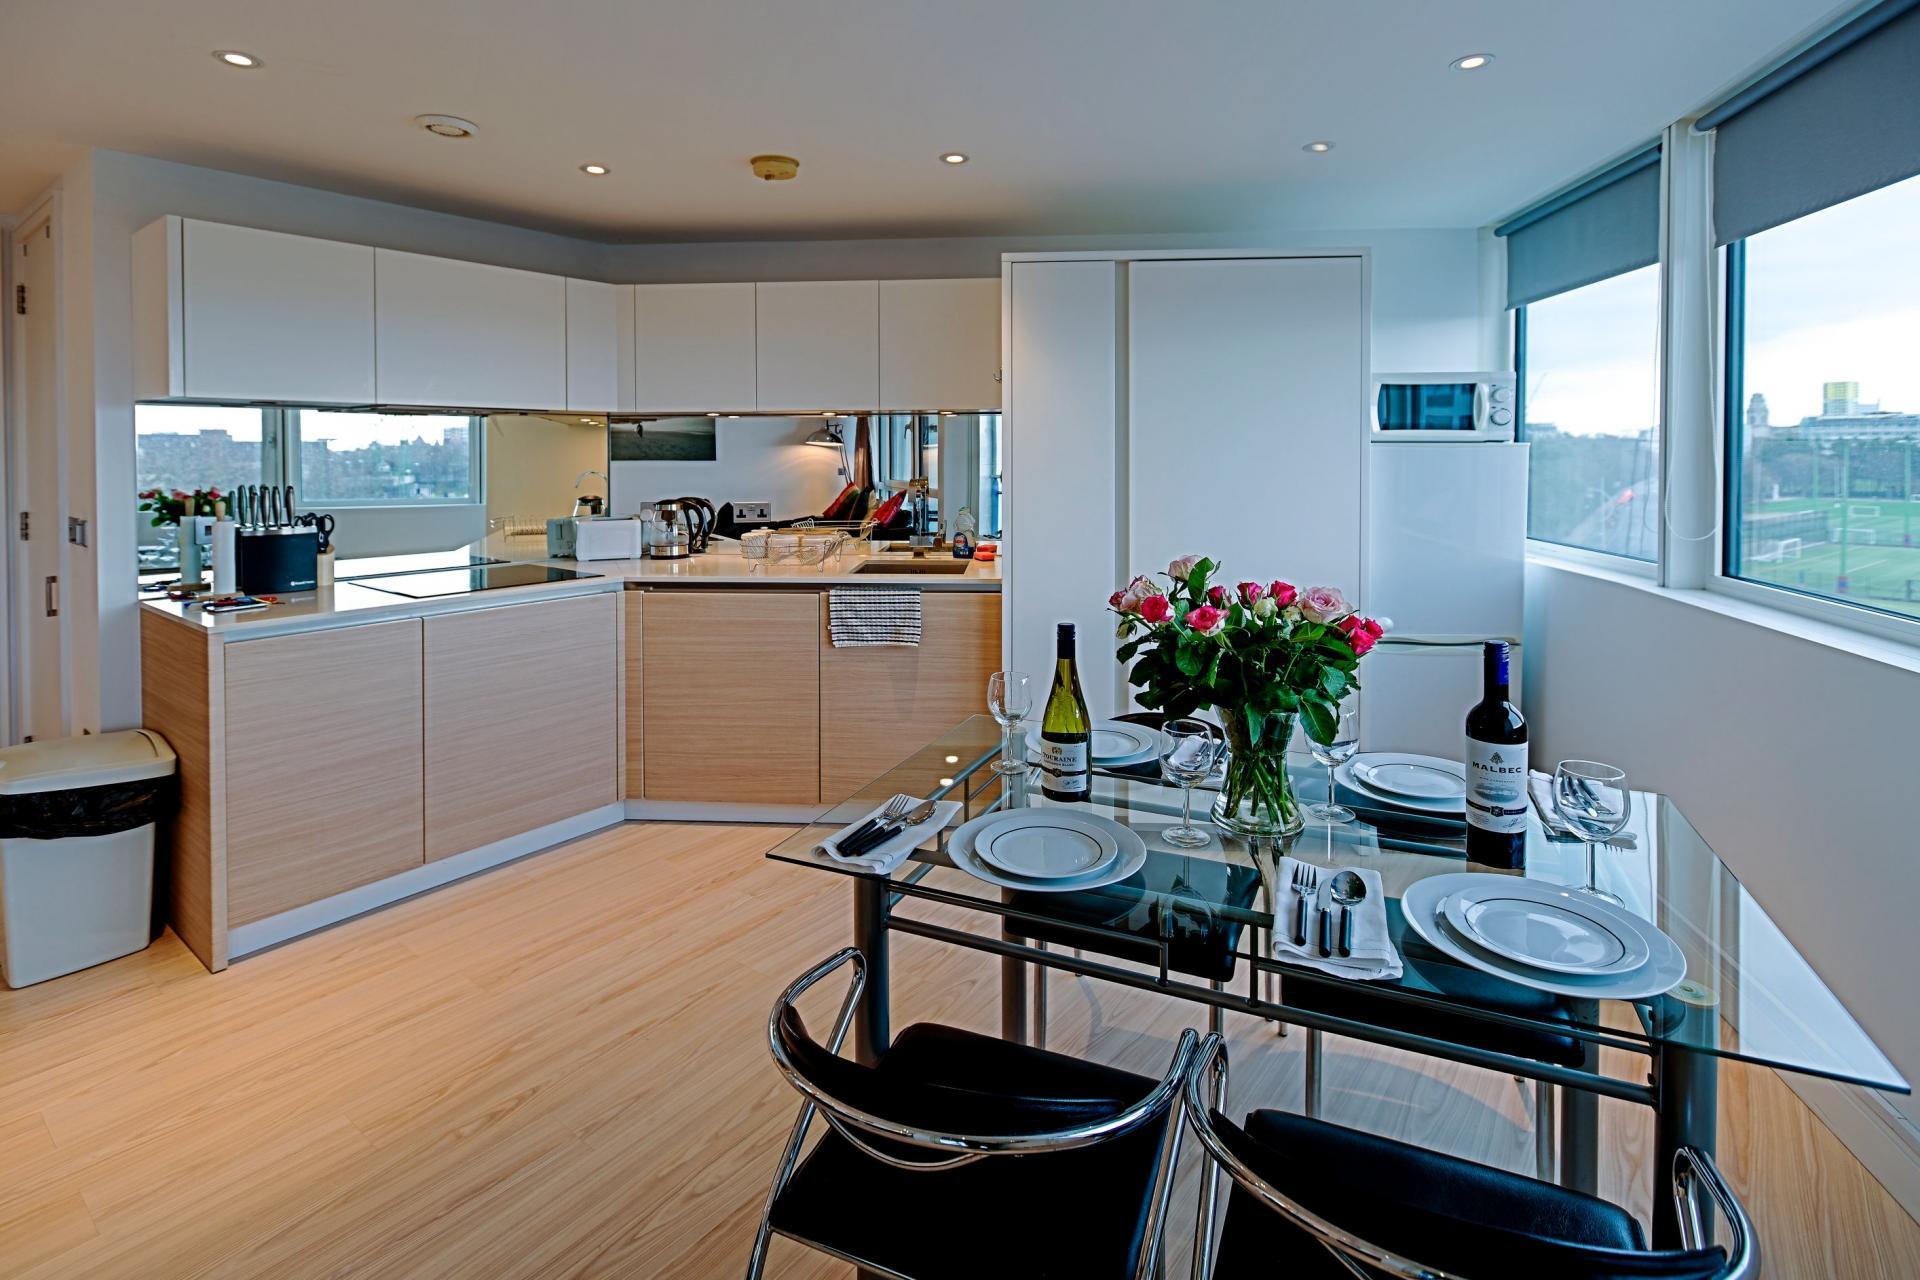 Kitchen at Gunwharf Quays Serviced Apartments